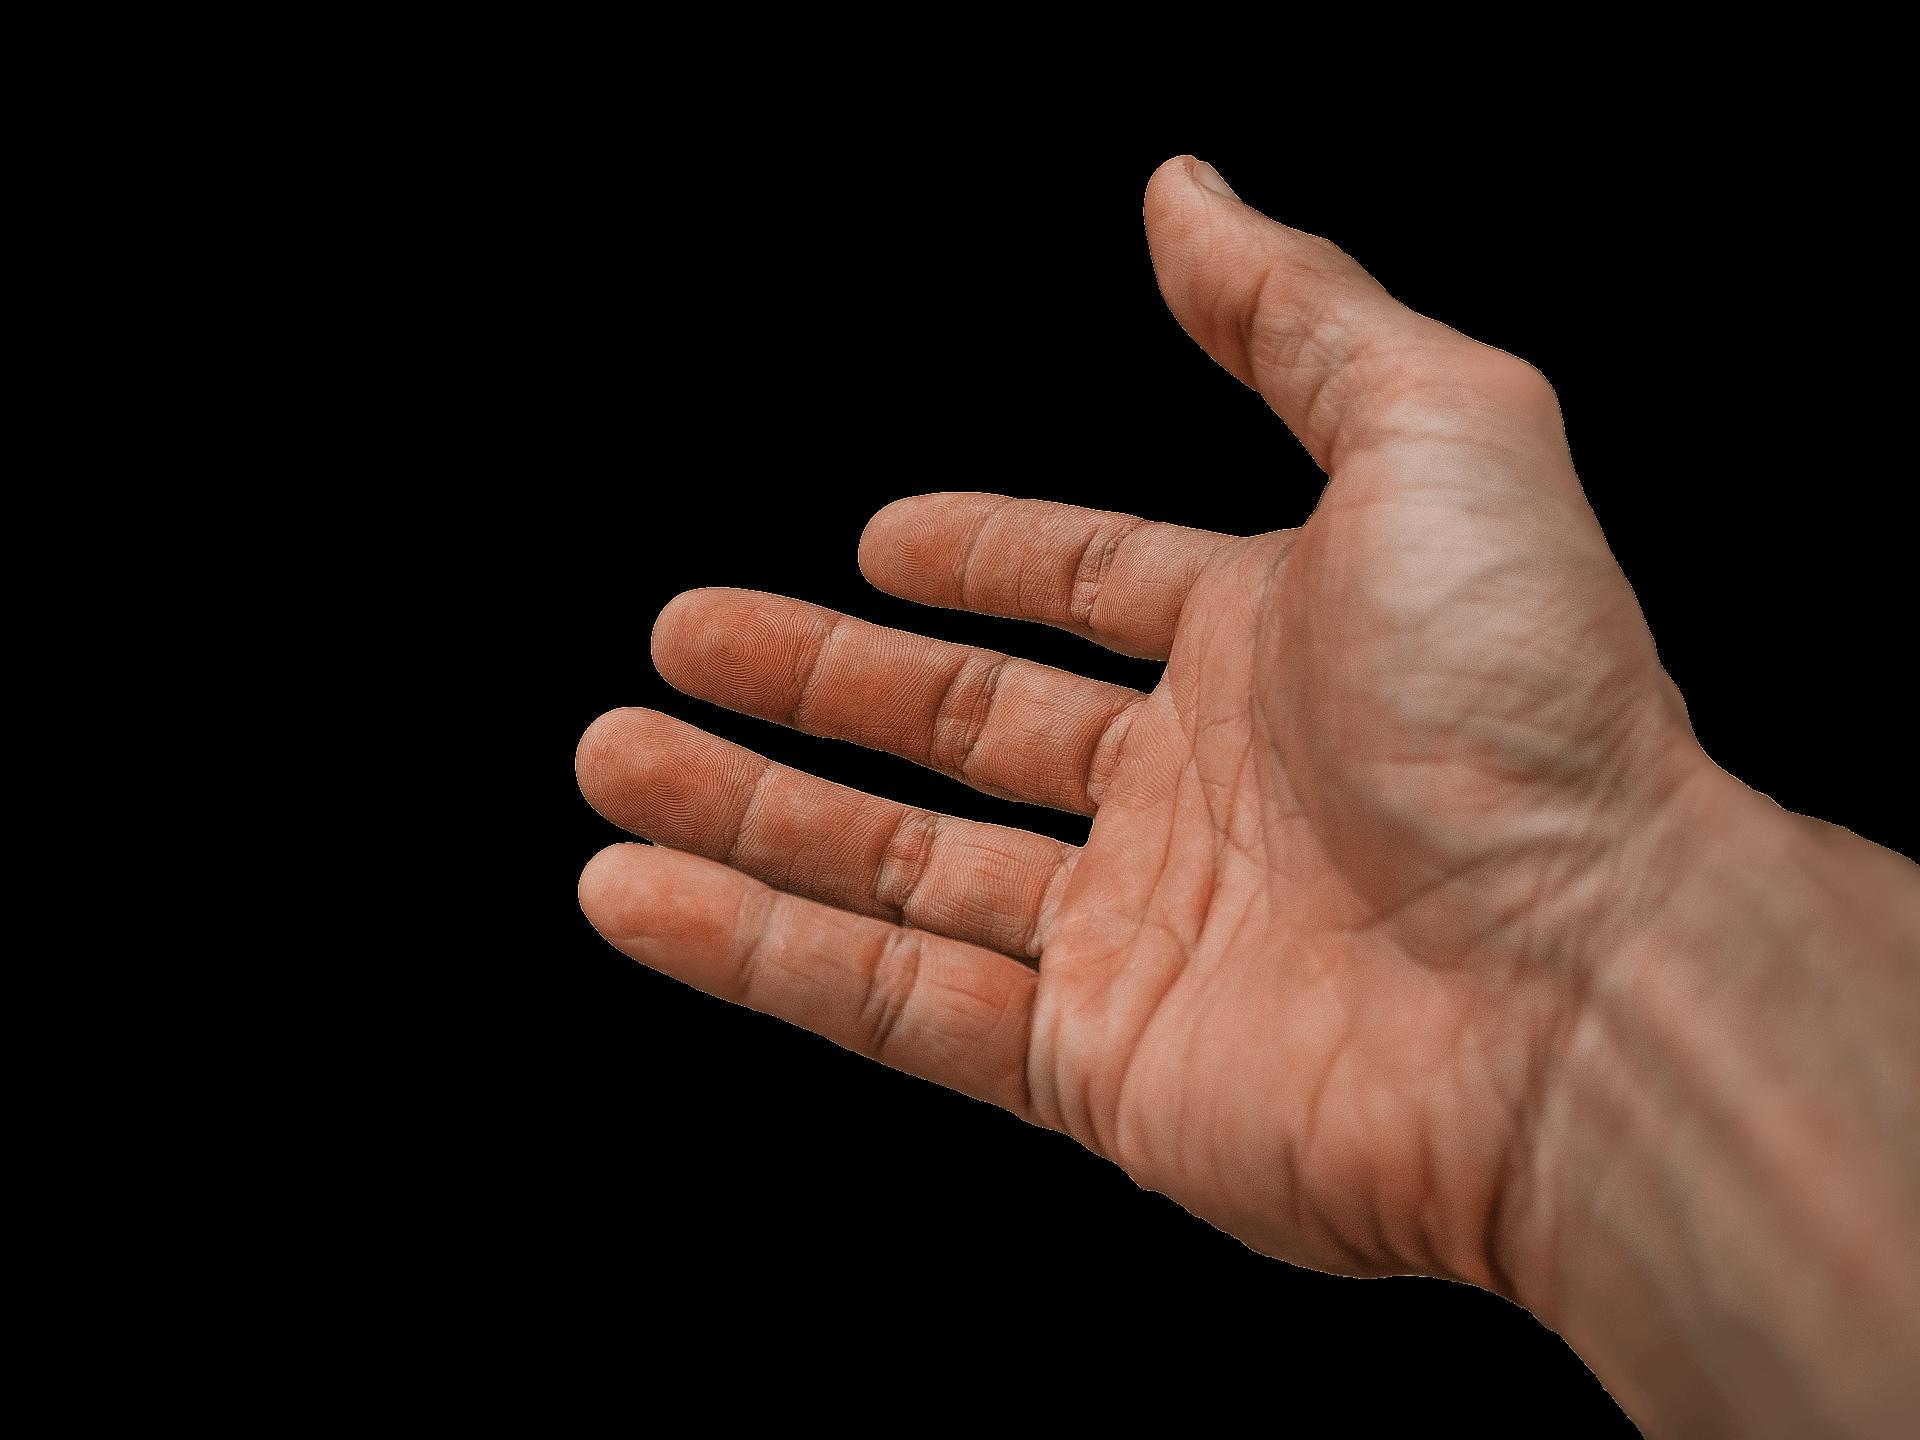 Heilpraxis Eisenschmidt: Karpaltunnelsyndrom